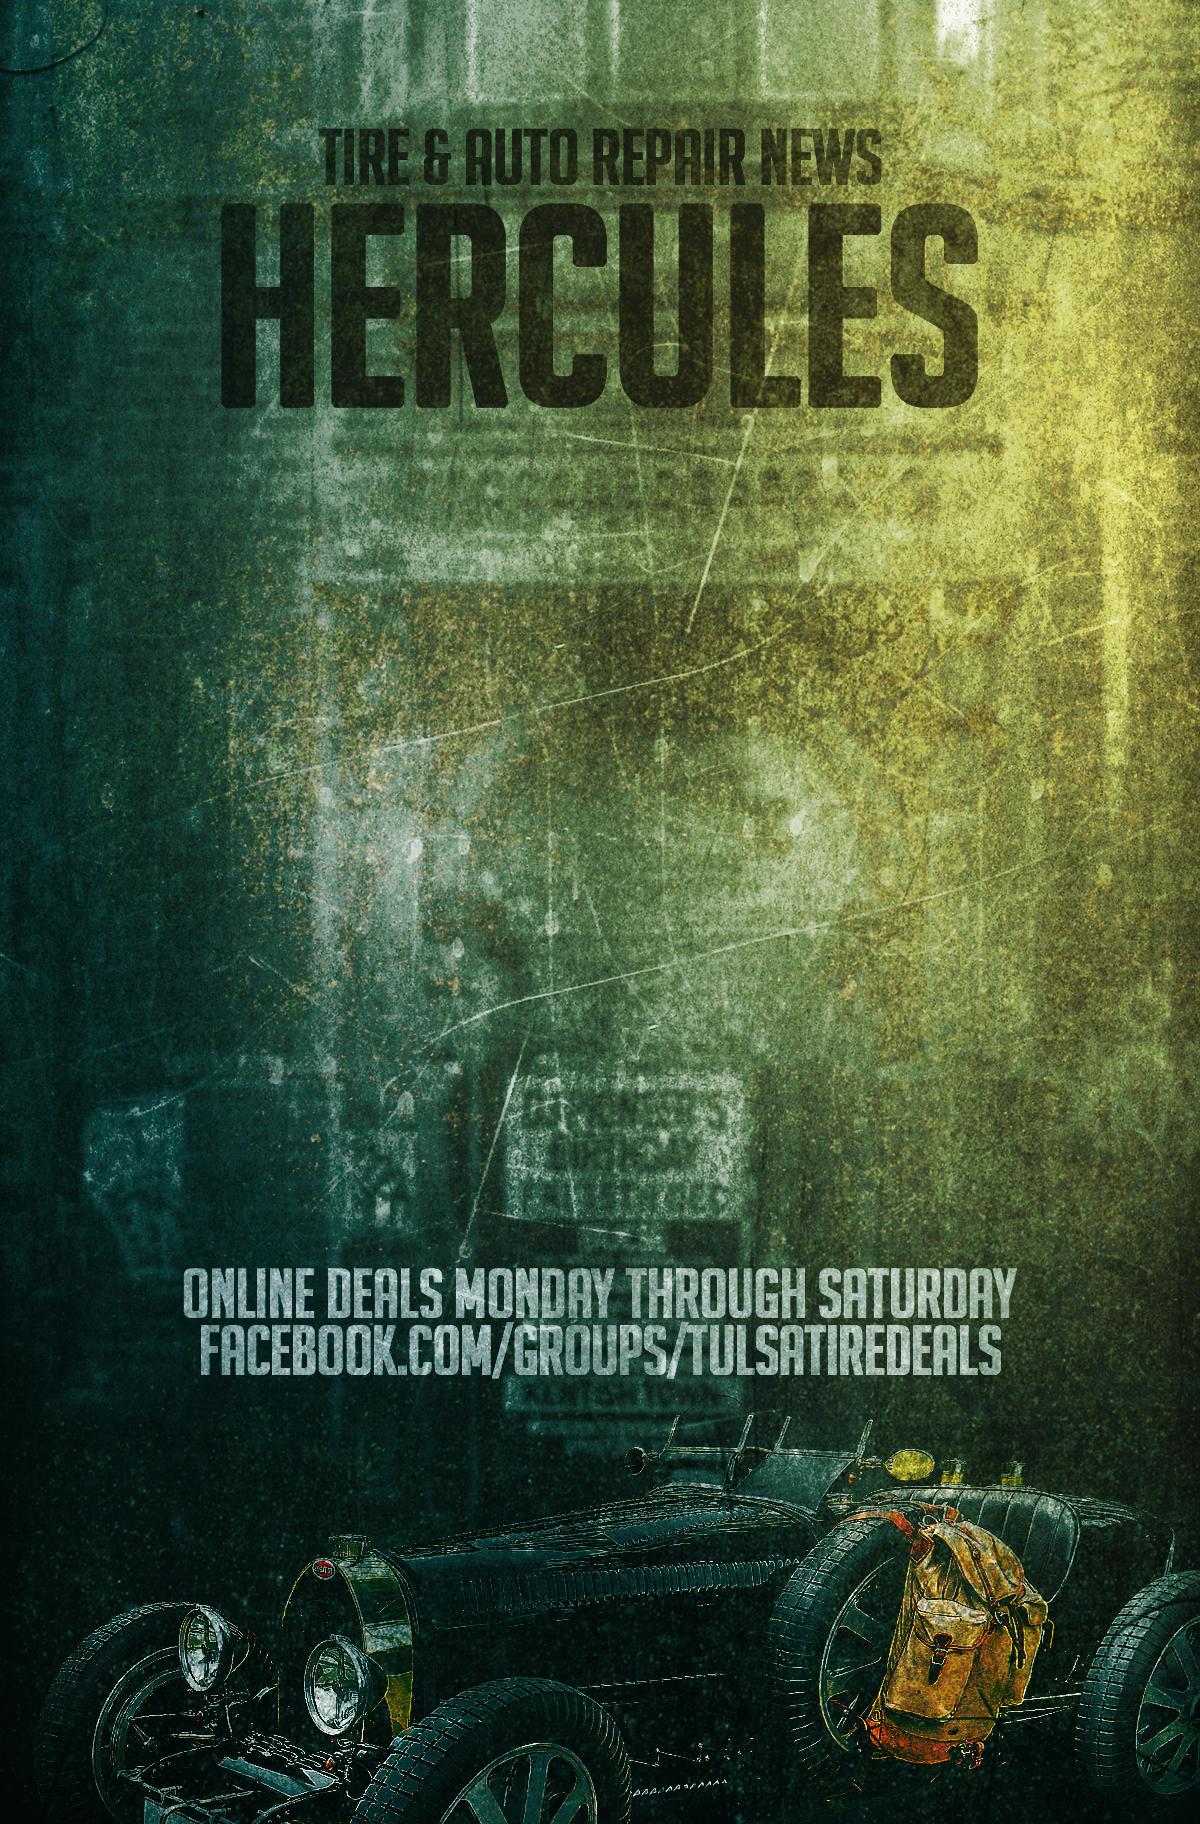 Hercules Tire & Auto Repair image 4